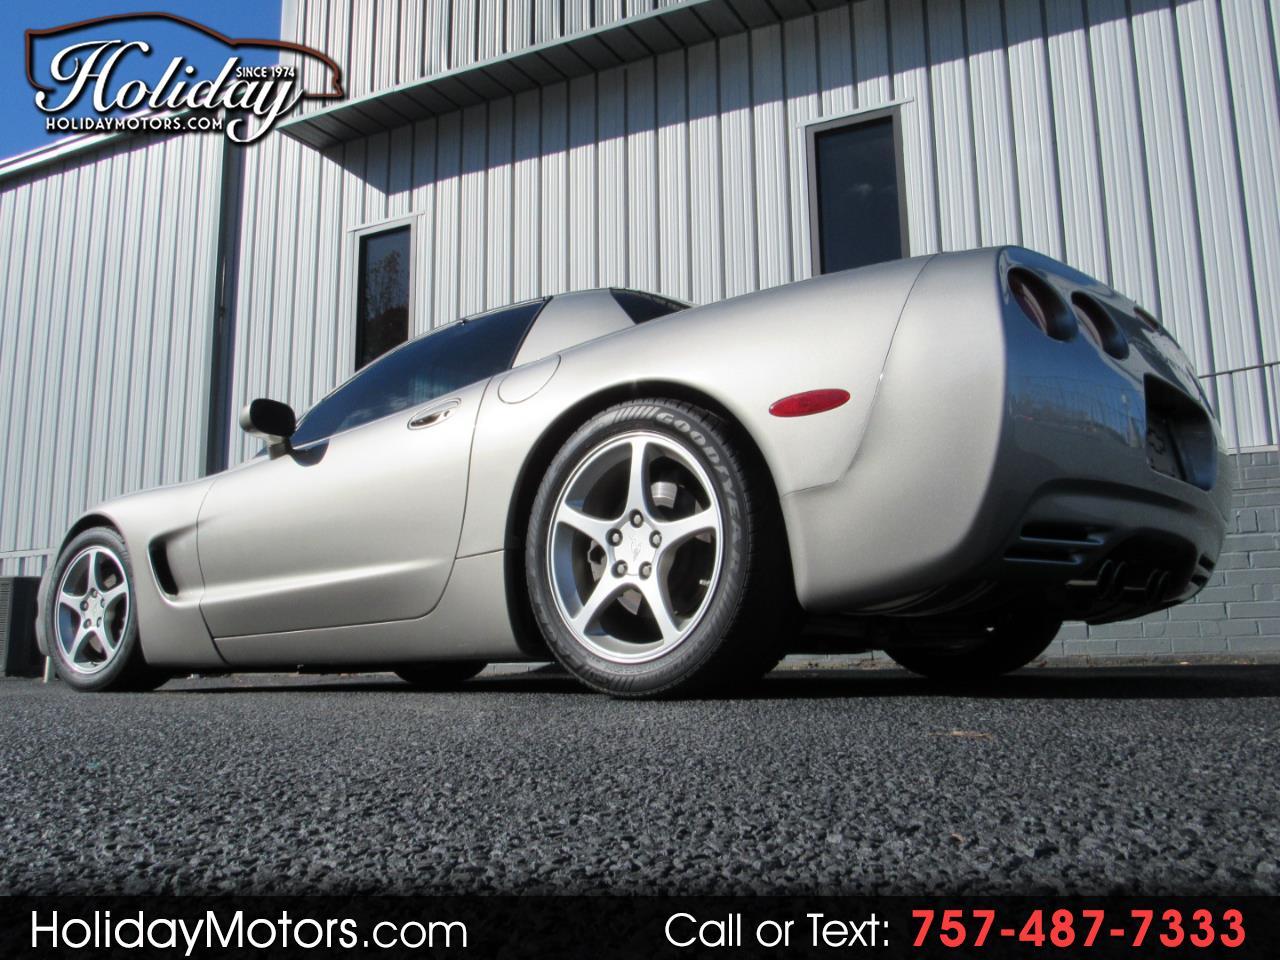 Chevrolet Corvette 2dr Hardtop 2000